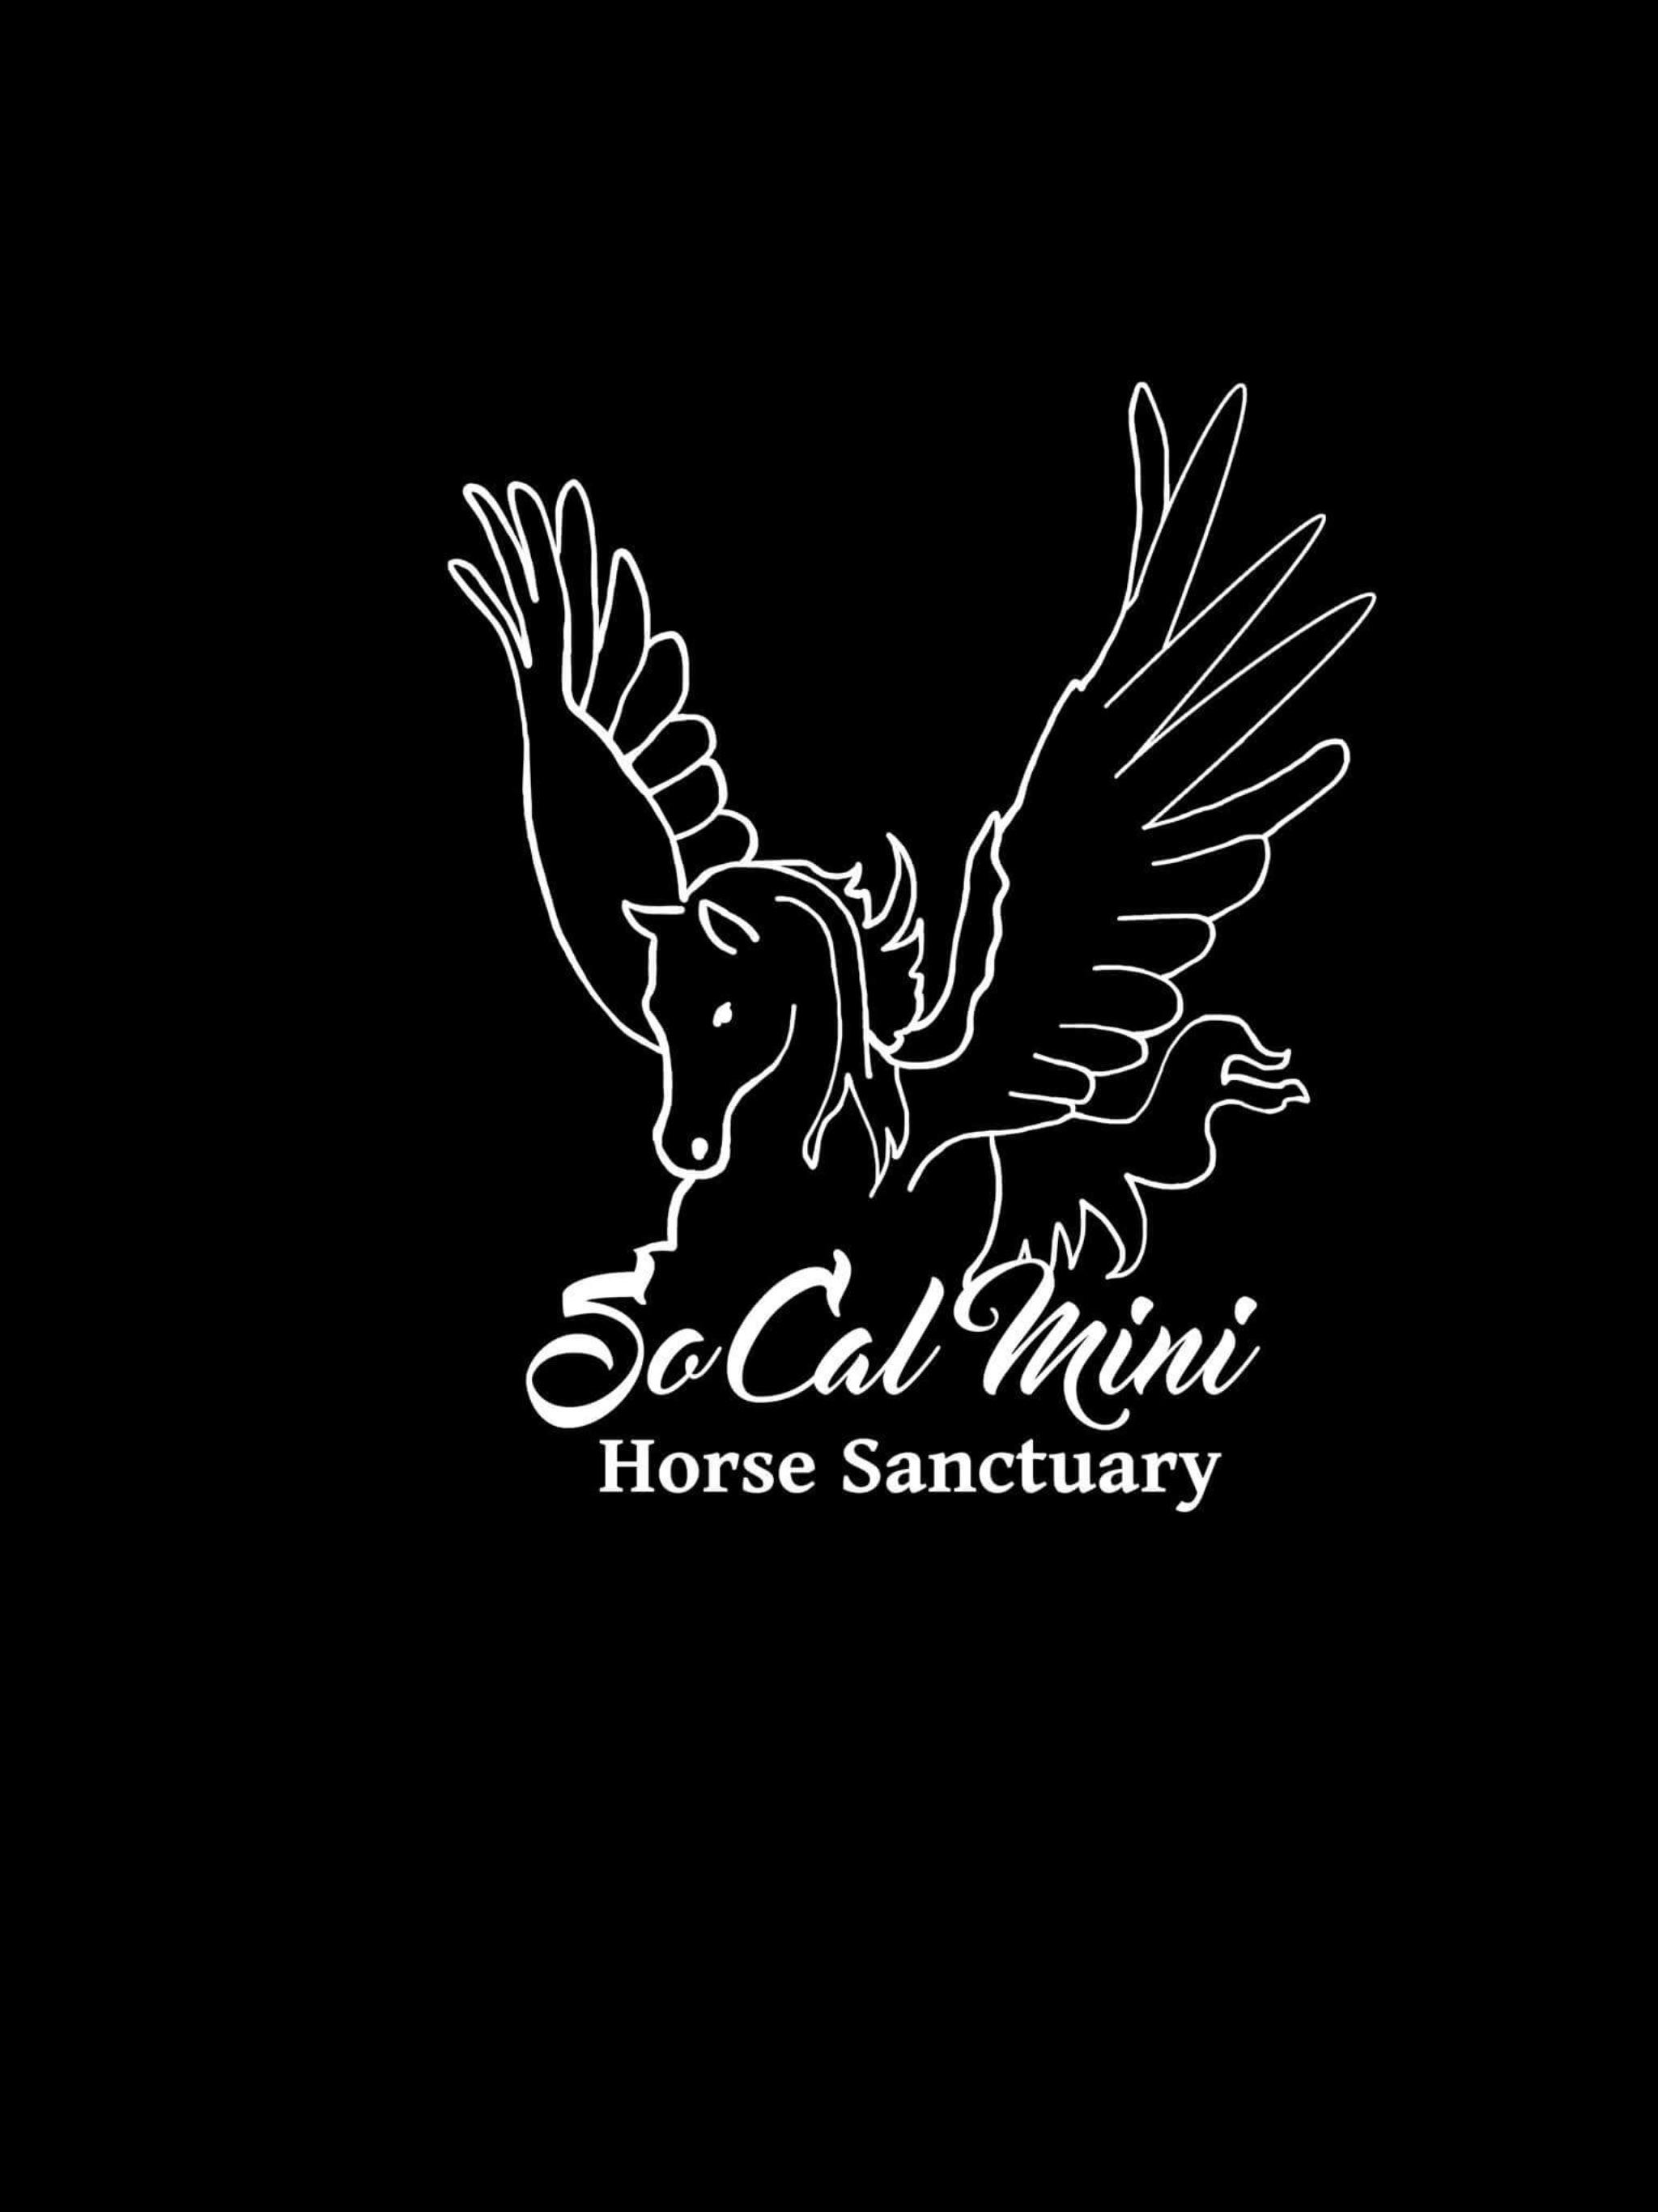 So Cal Mini Horse Sanctuary